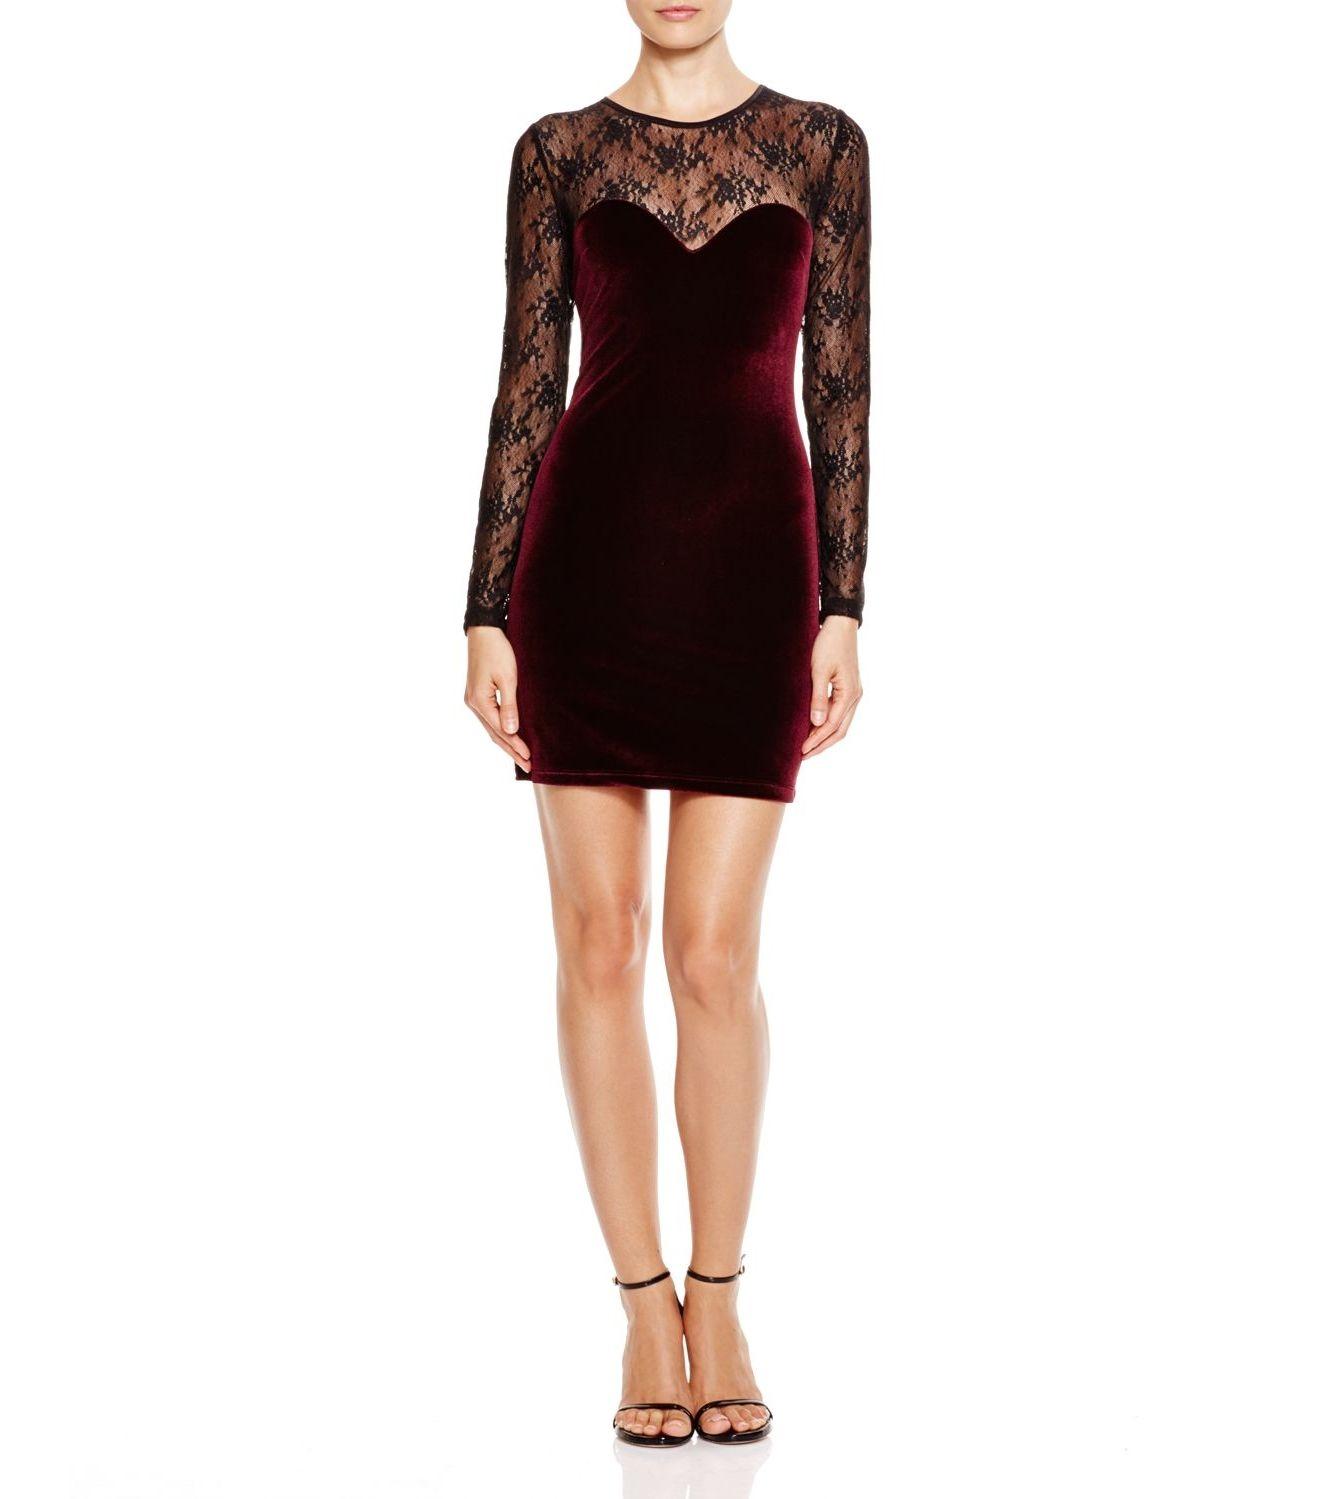 AQUA Velvet Lace Illusion BodyCon Dress. Taille M. REF 3465/M.